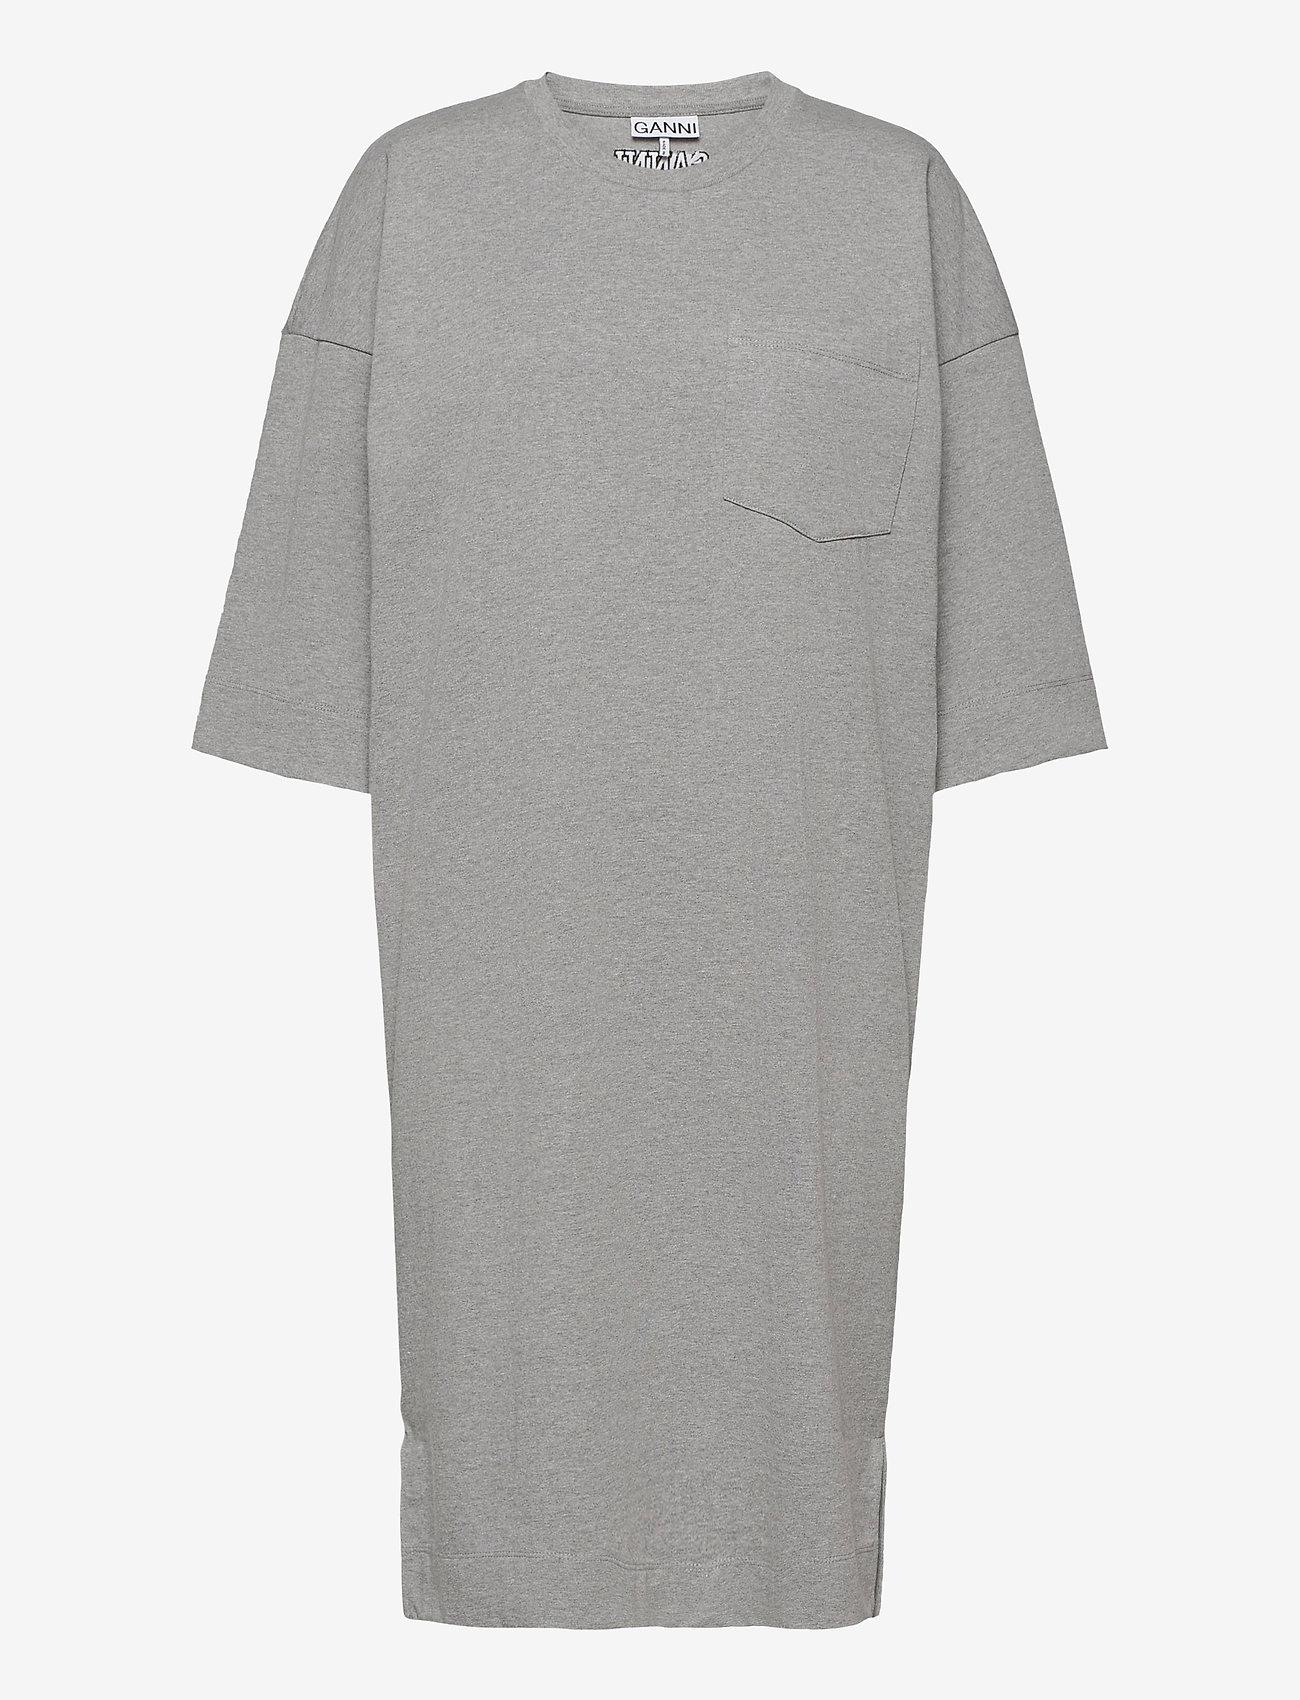 Ganni - Software Jersey - t-shirtkjoler - paloma melange - 0